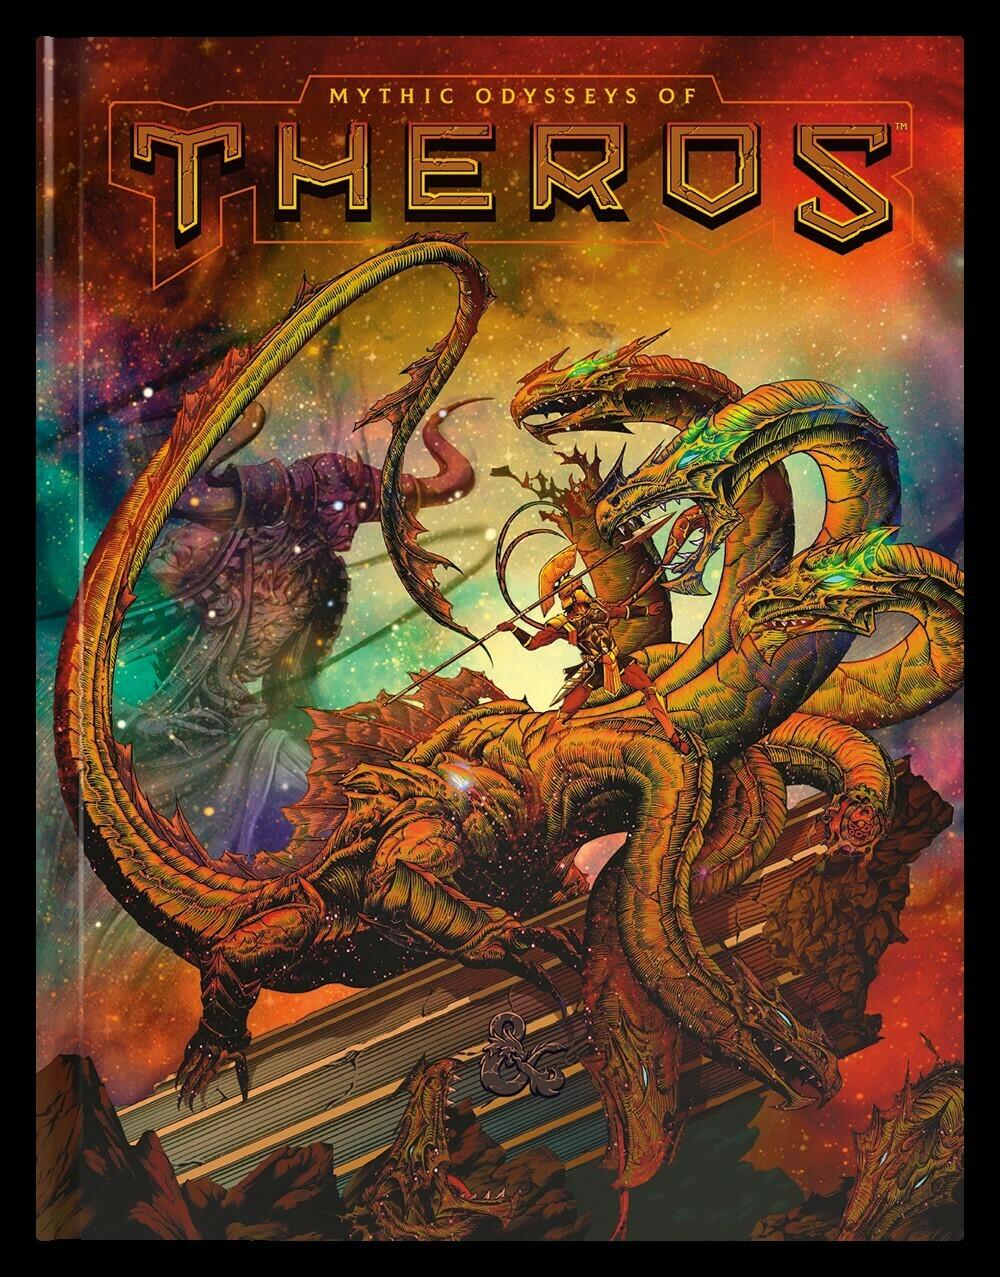 D&D Mythic Odyssey of Theros Edizione Limitata - Quinta Ed.